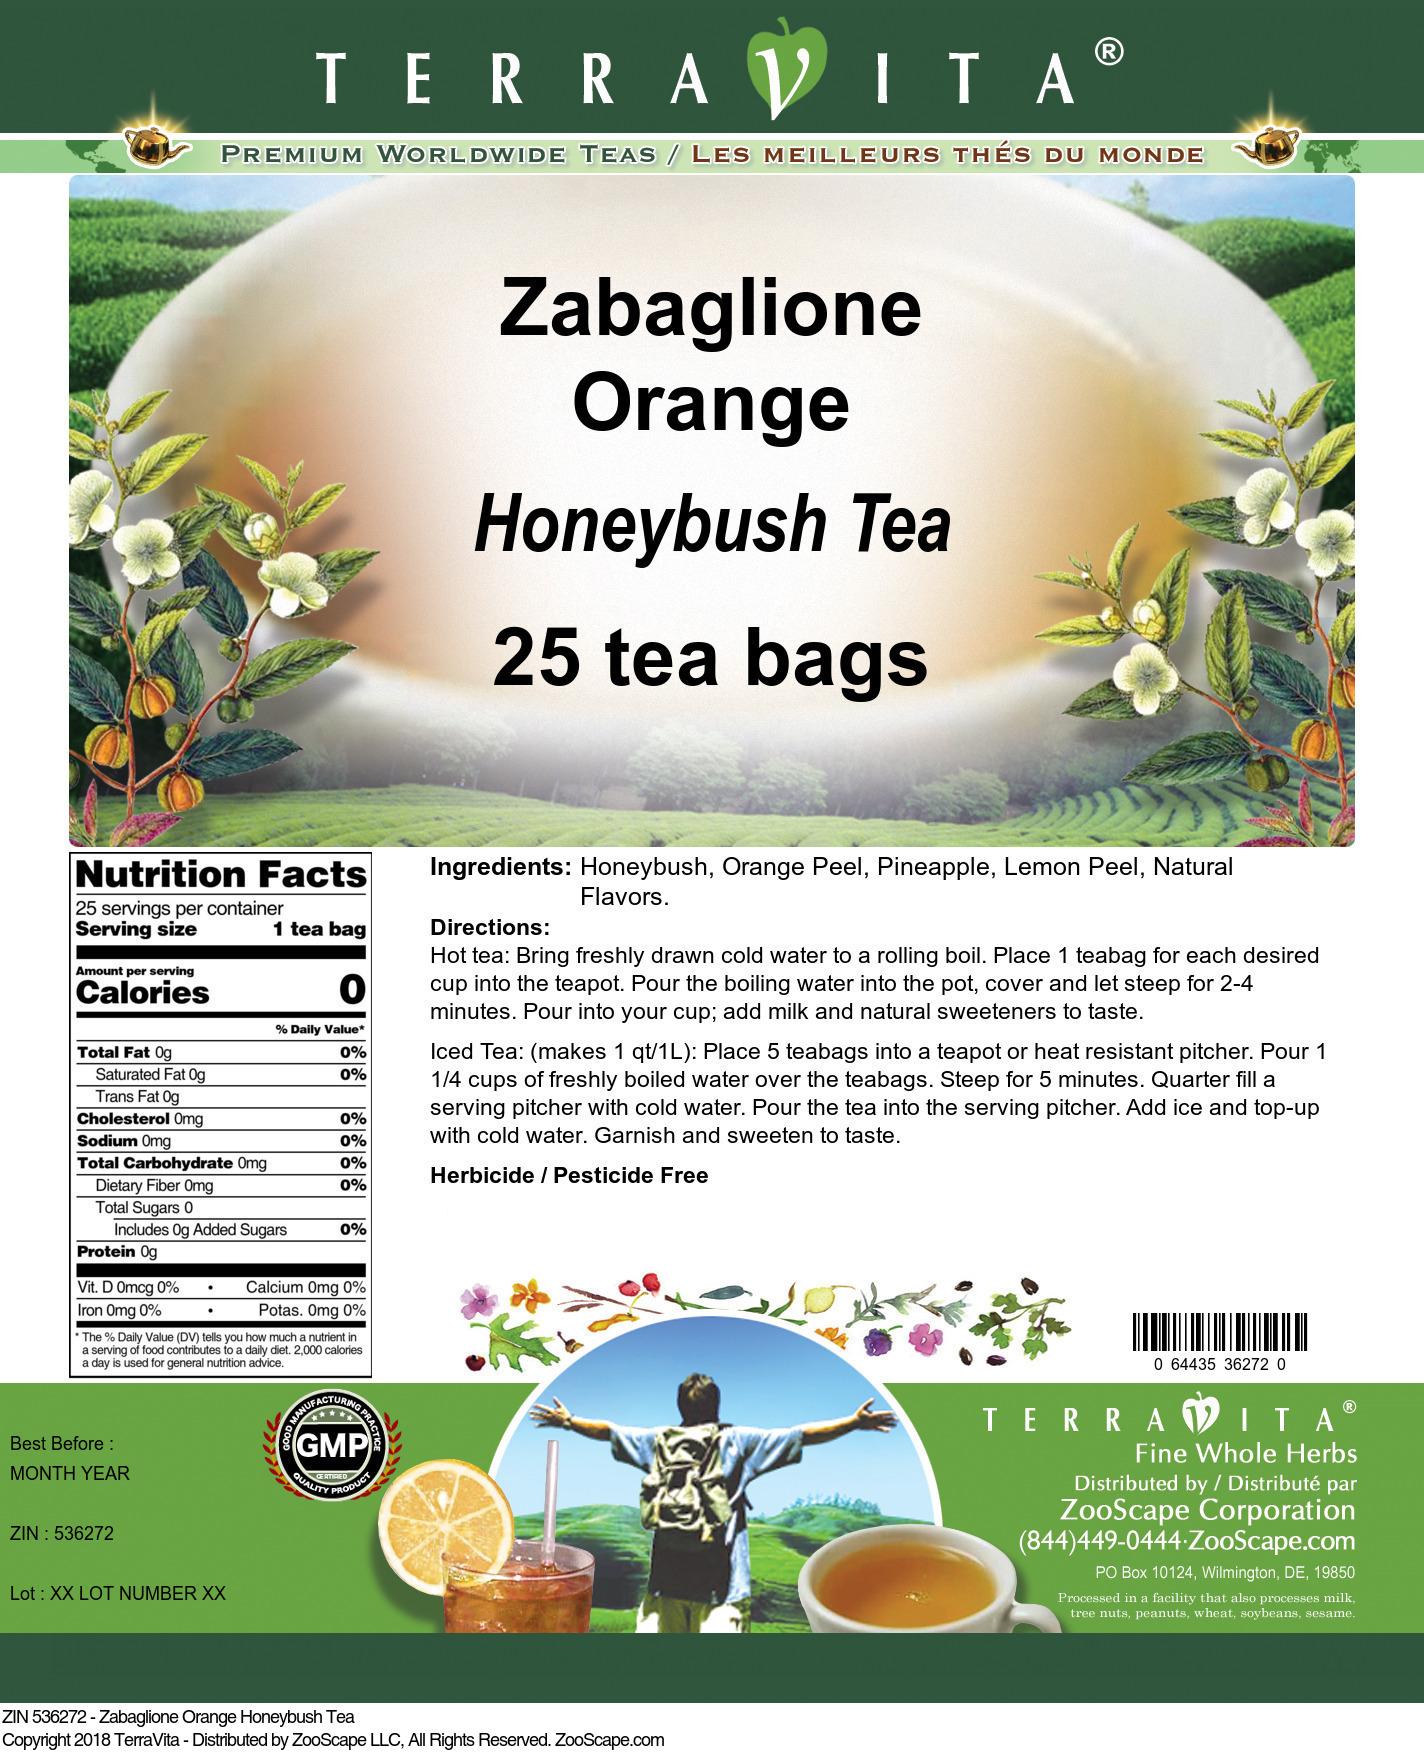 Zabaglione Orange Honeybush Tea